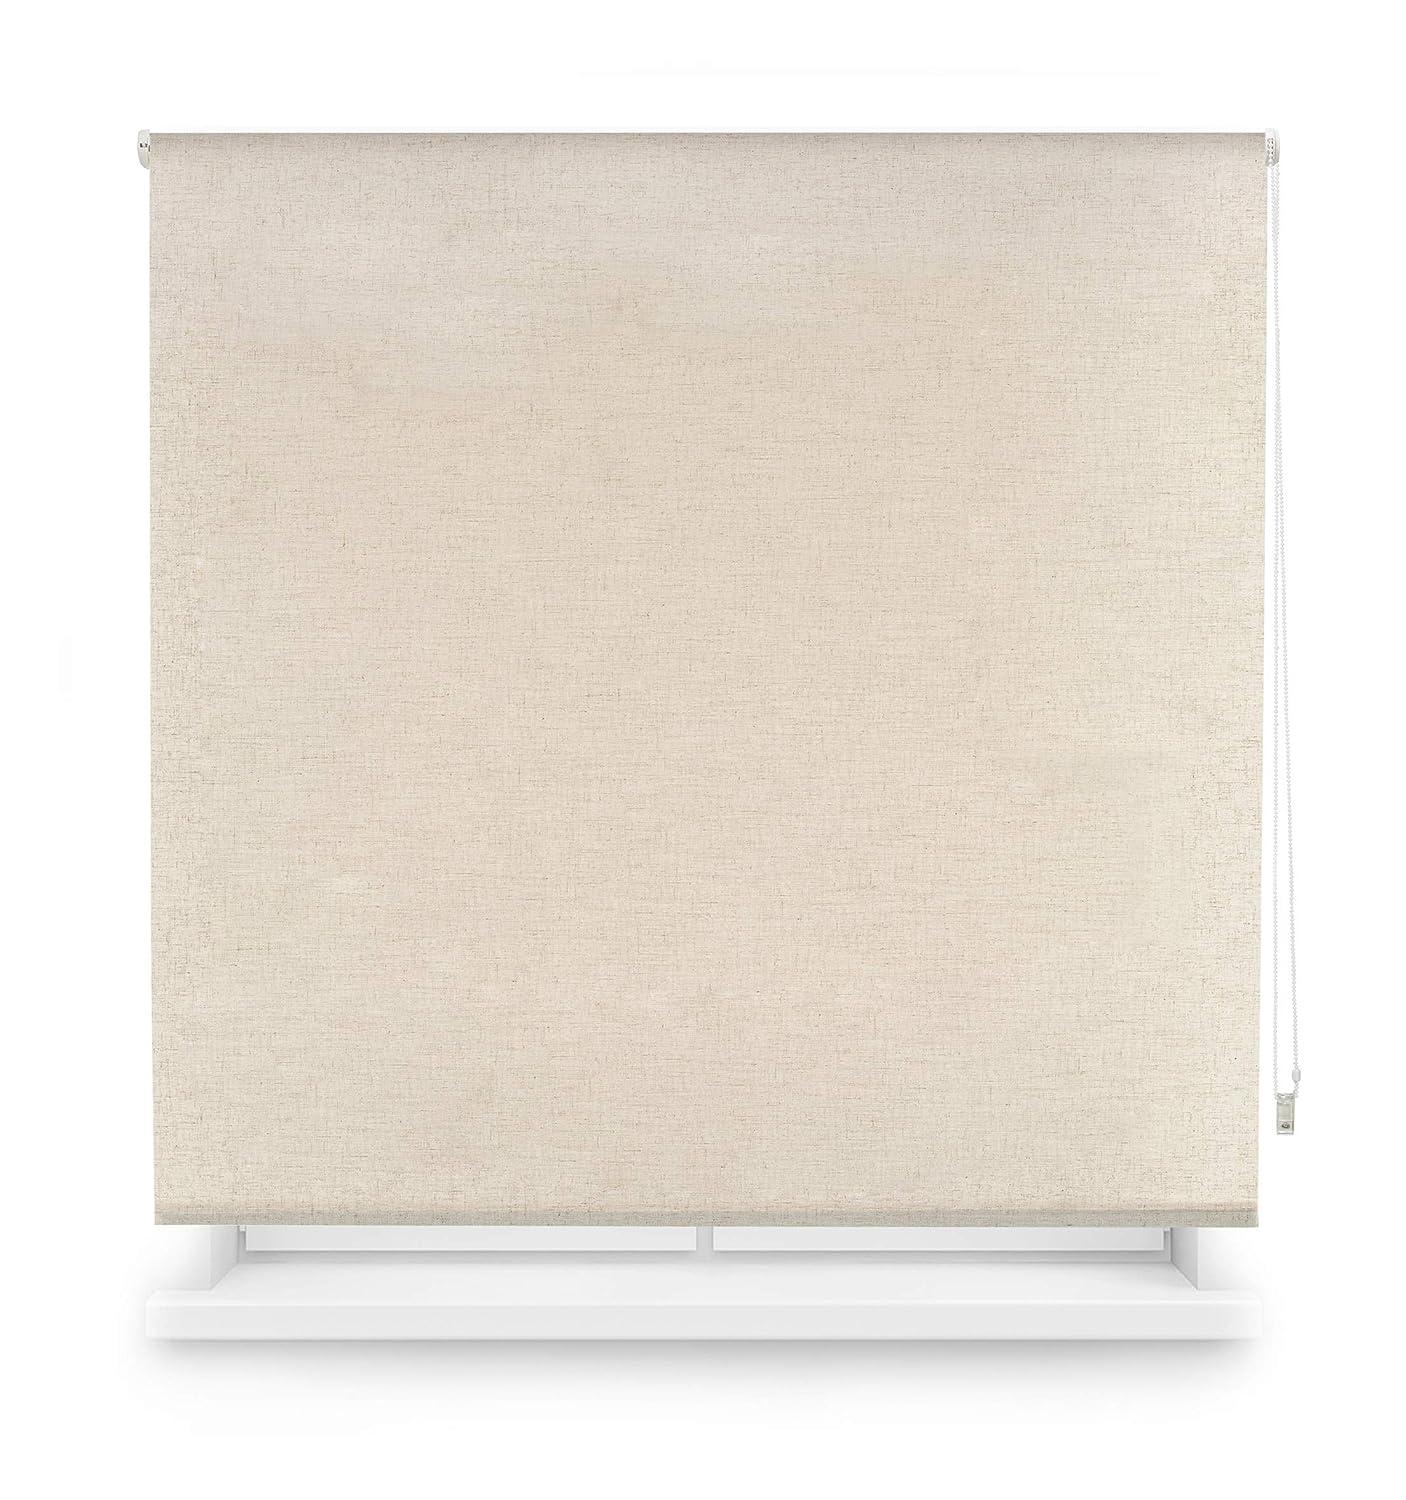 Blindecor Estor Enrollable Translucido Liso, Poliéster, Lino, 160 x 200 cm